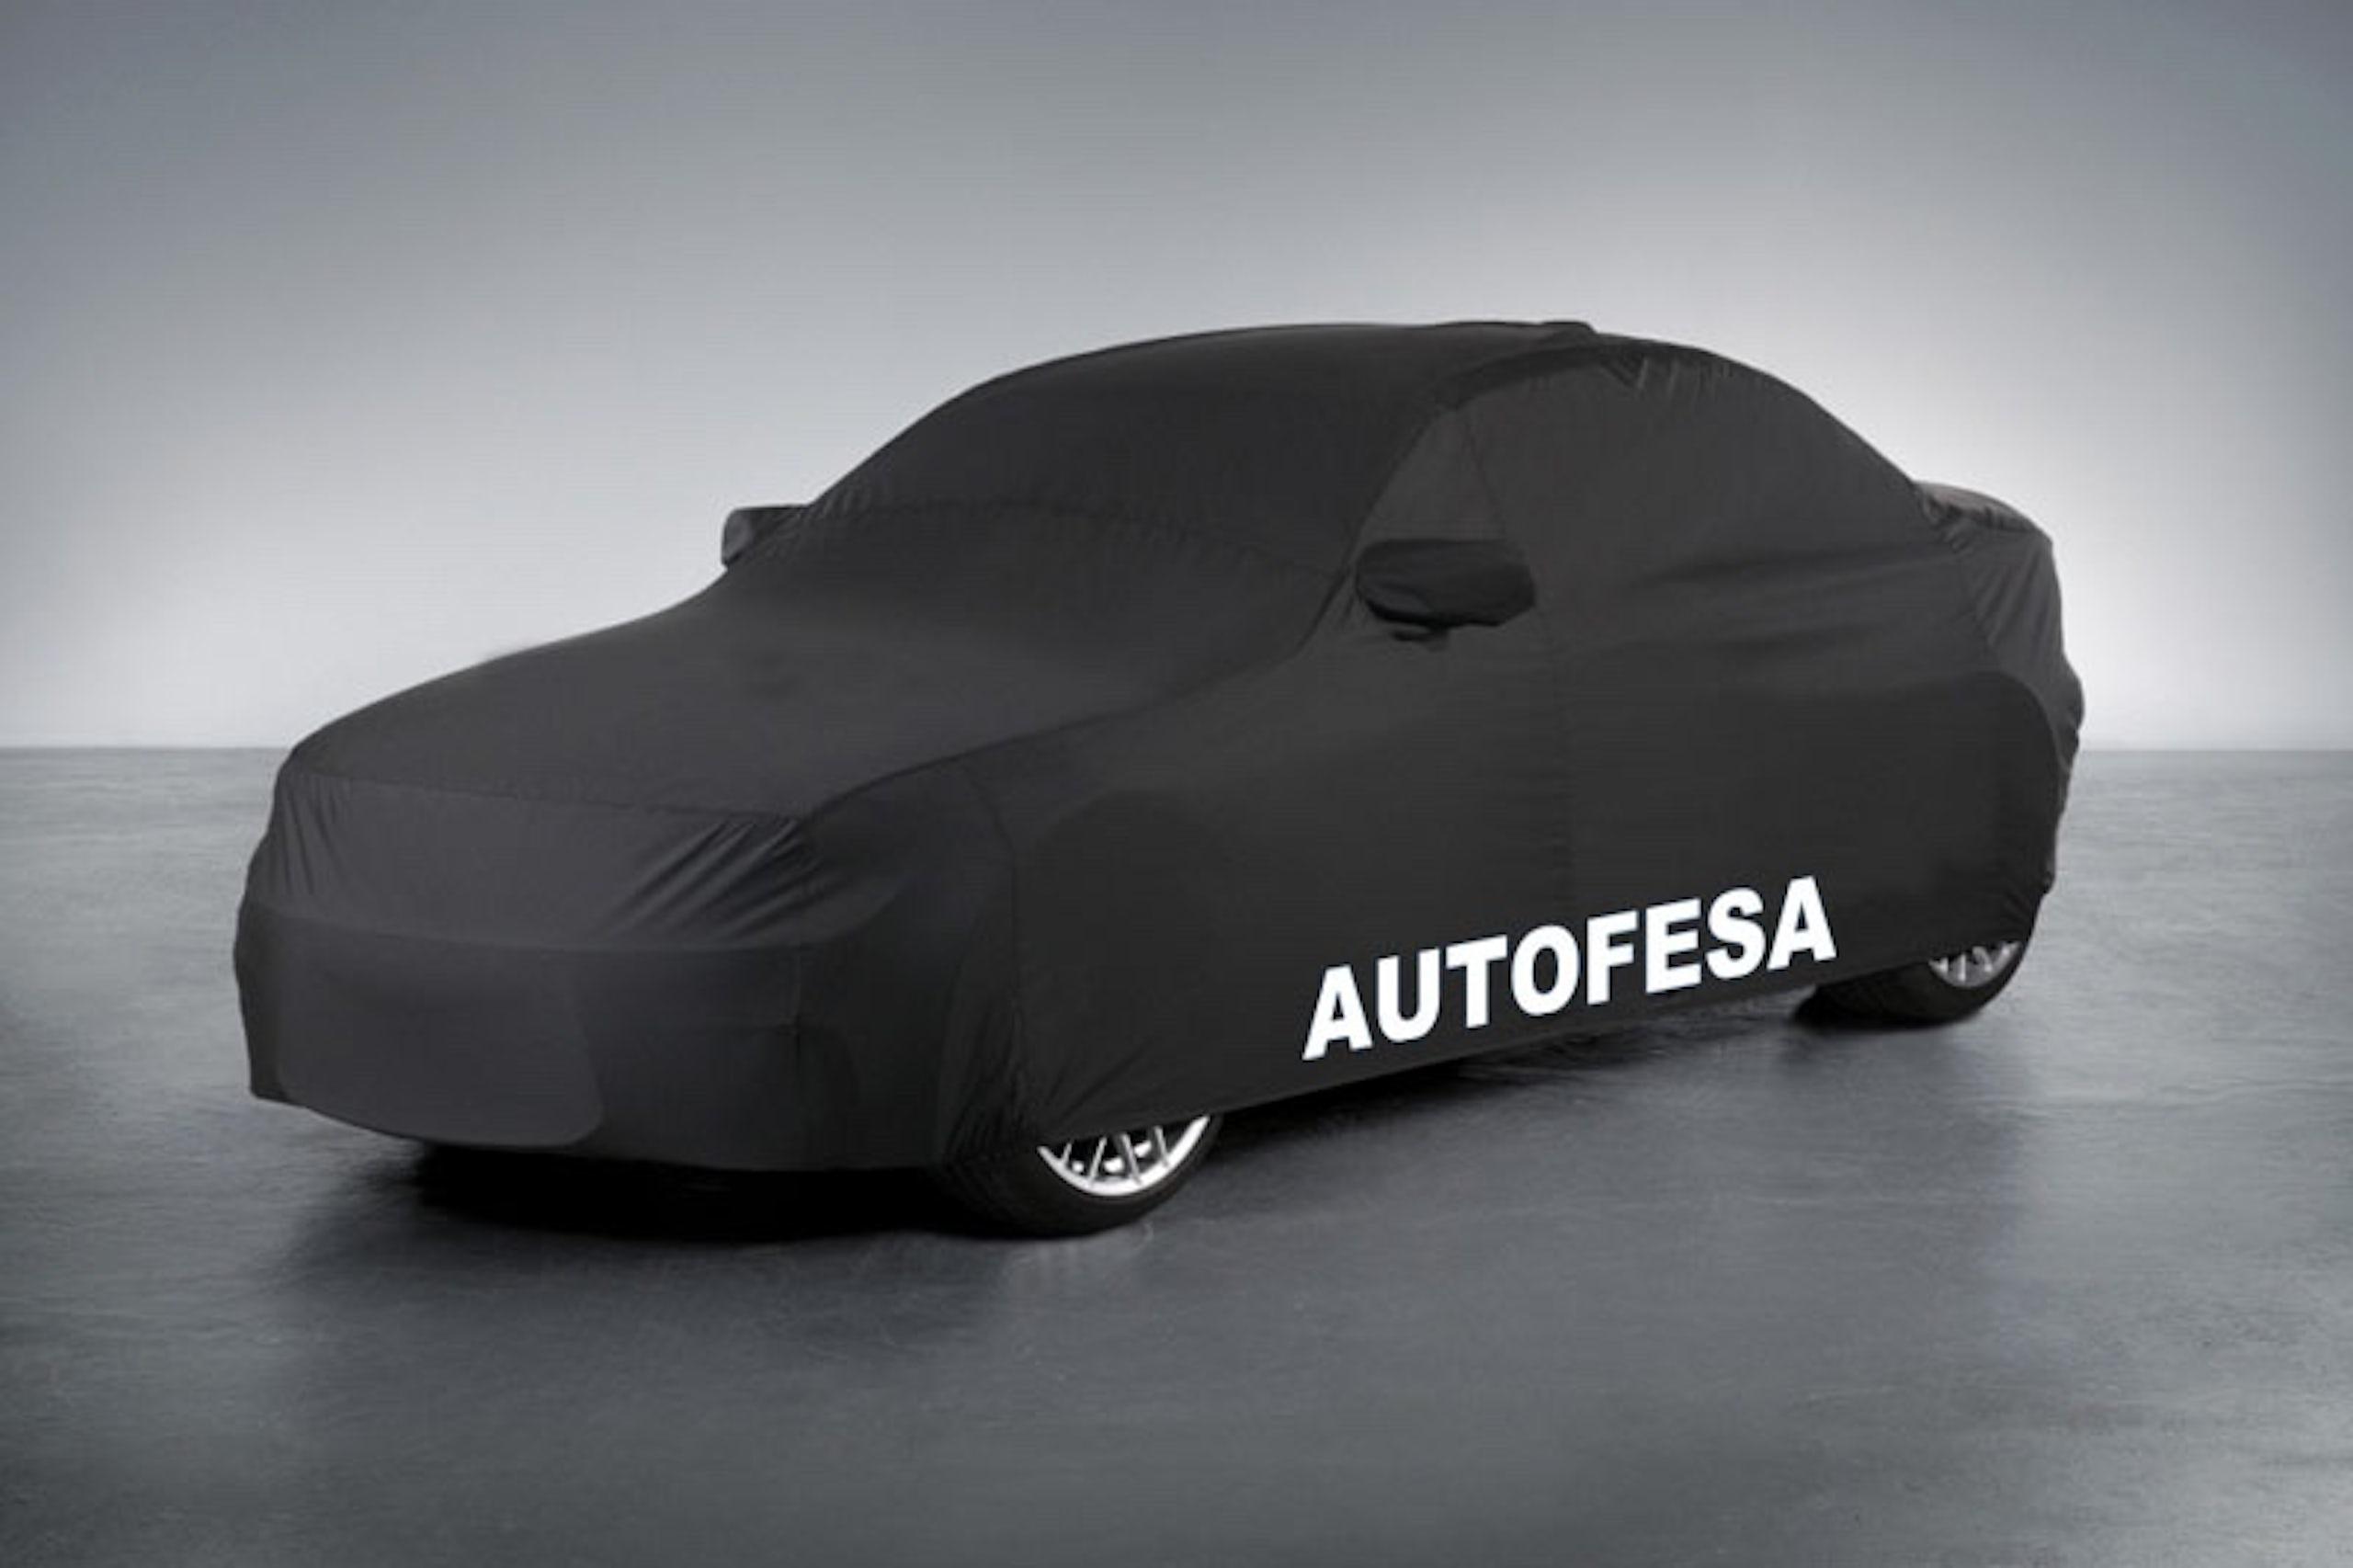 Audi Q5 2.0 TDI 170cv quattro 5p S tronic Auto - Foto 7